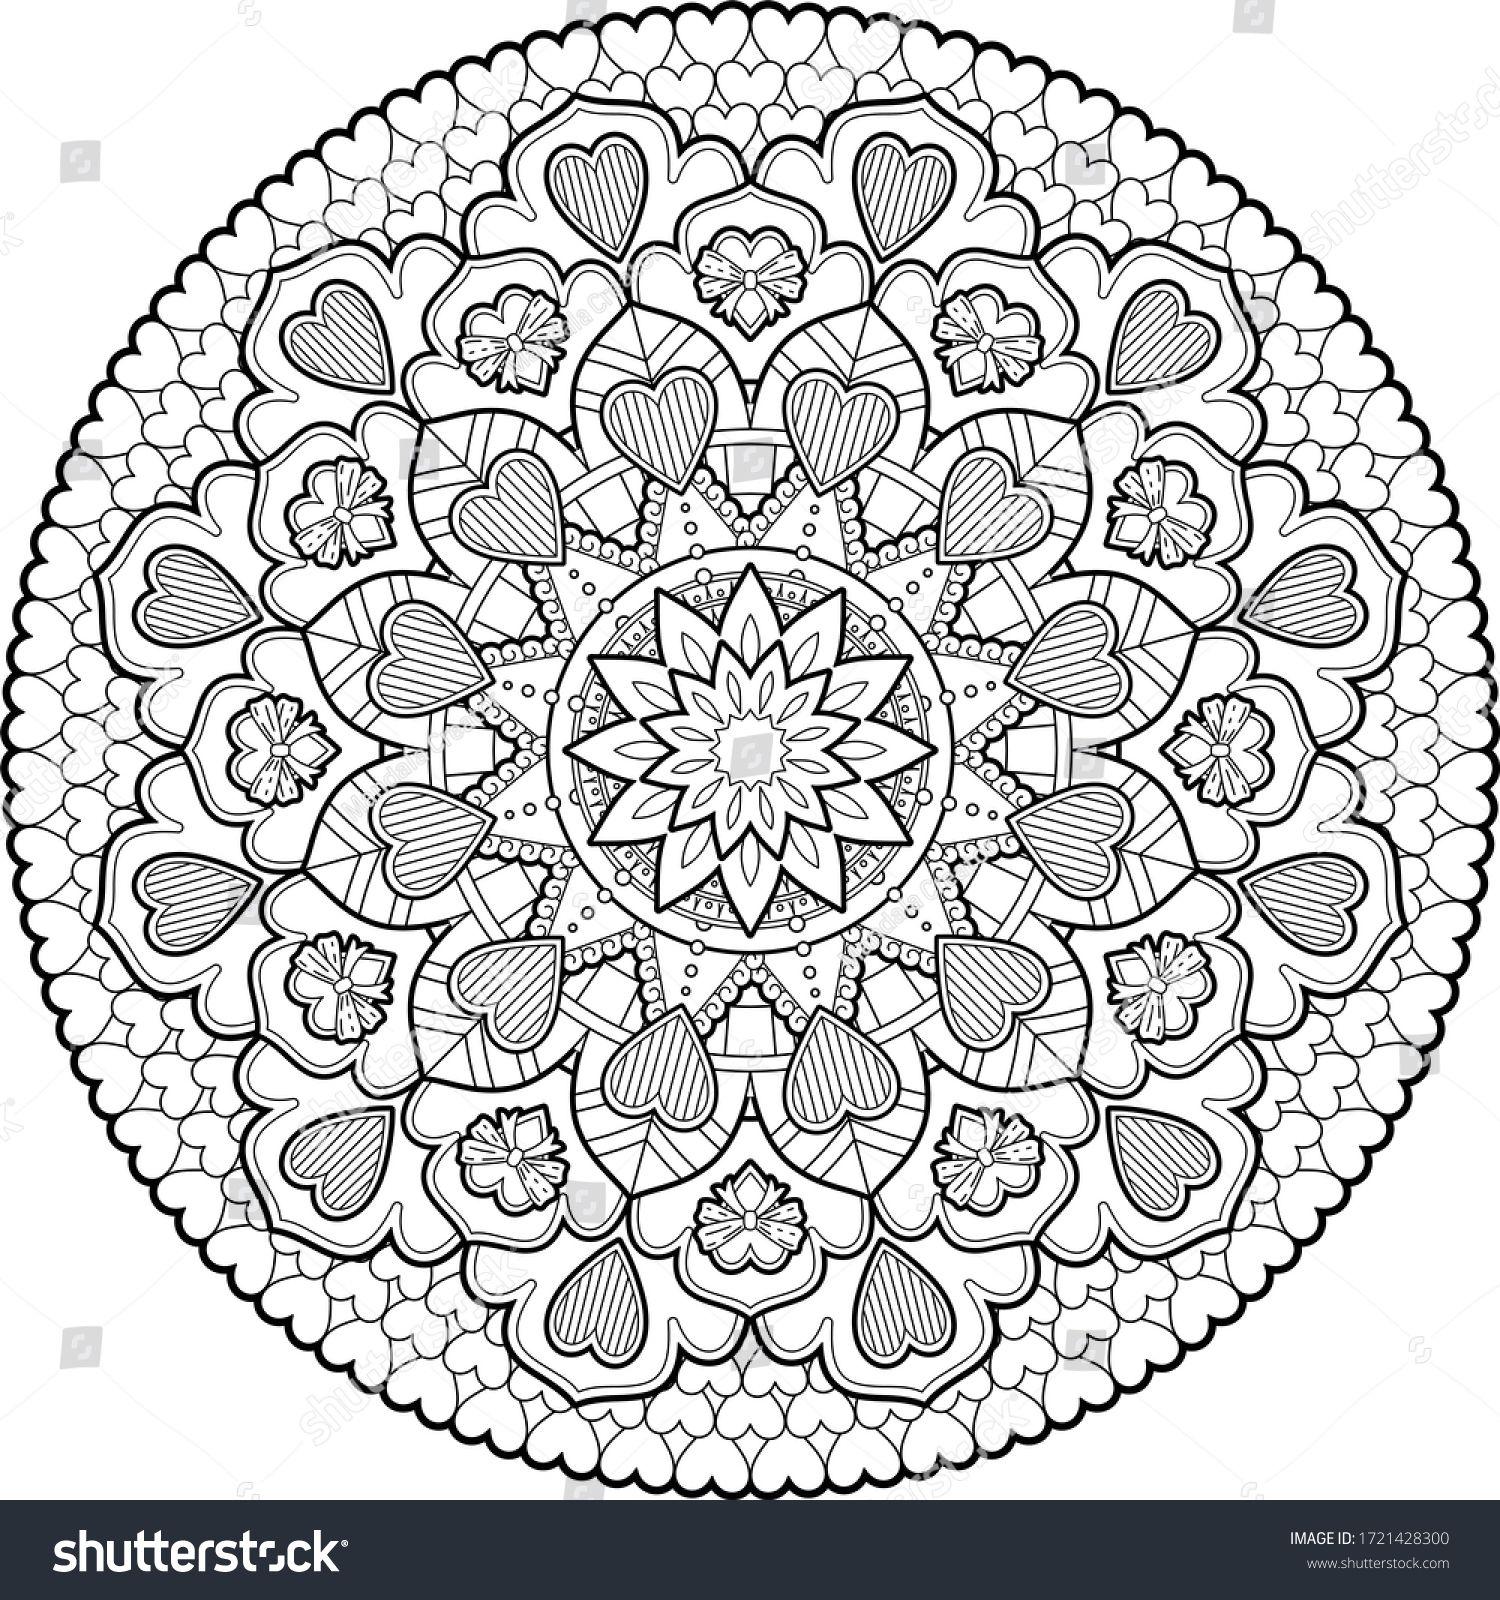 Hearts Roses Mandala Art Meditation Color ภาพประกอบสต อก 1721428300 ม นดาลา ภาพประกอบ